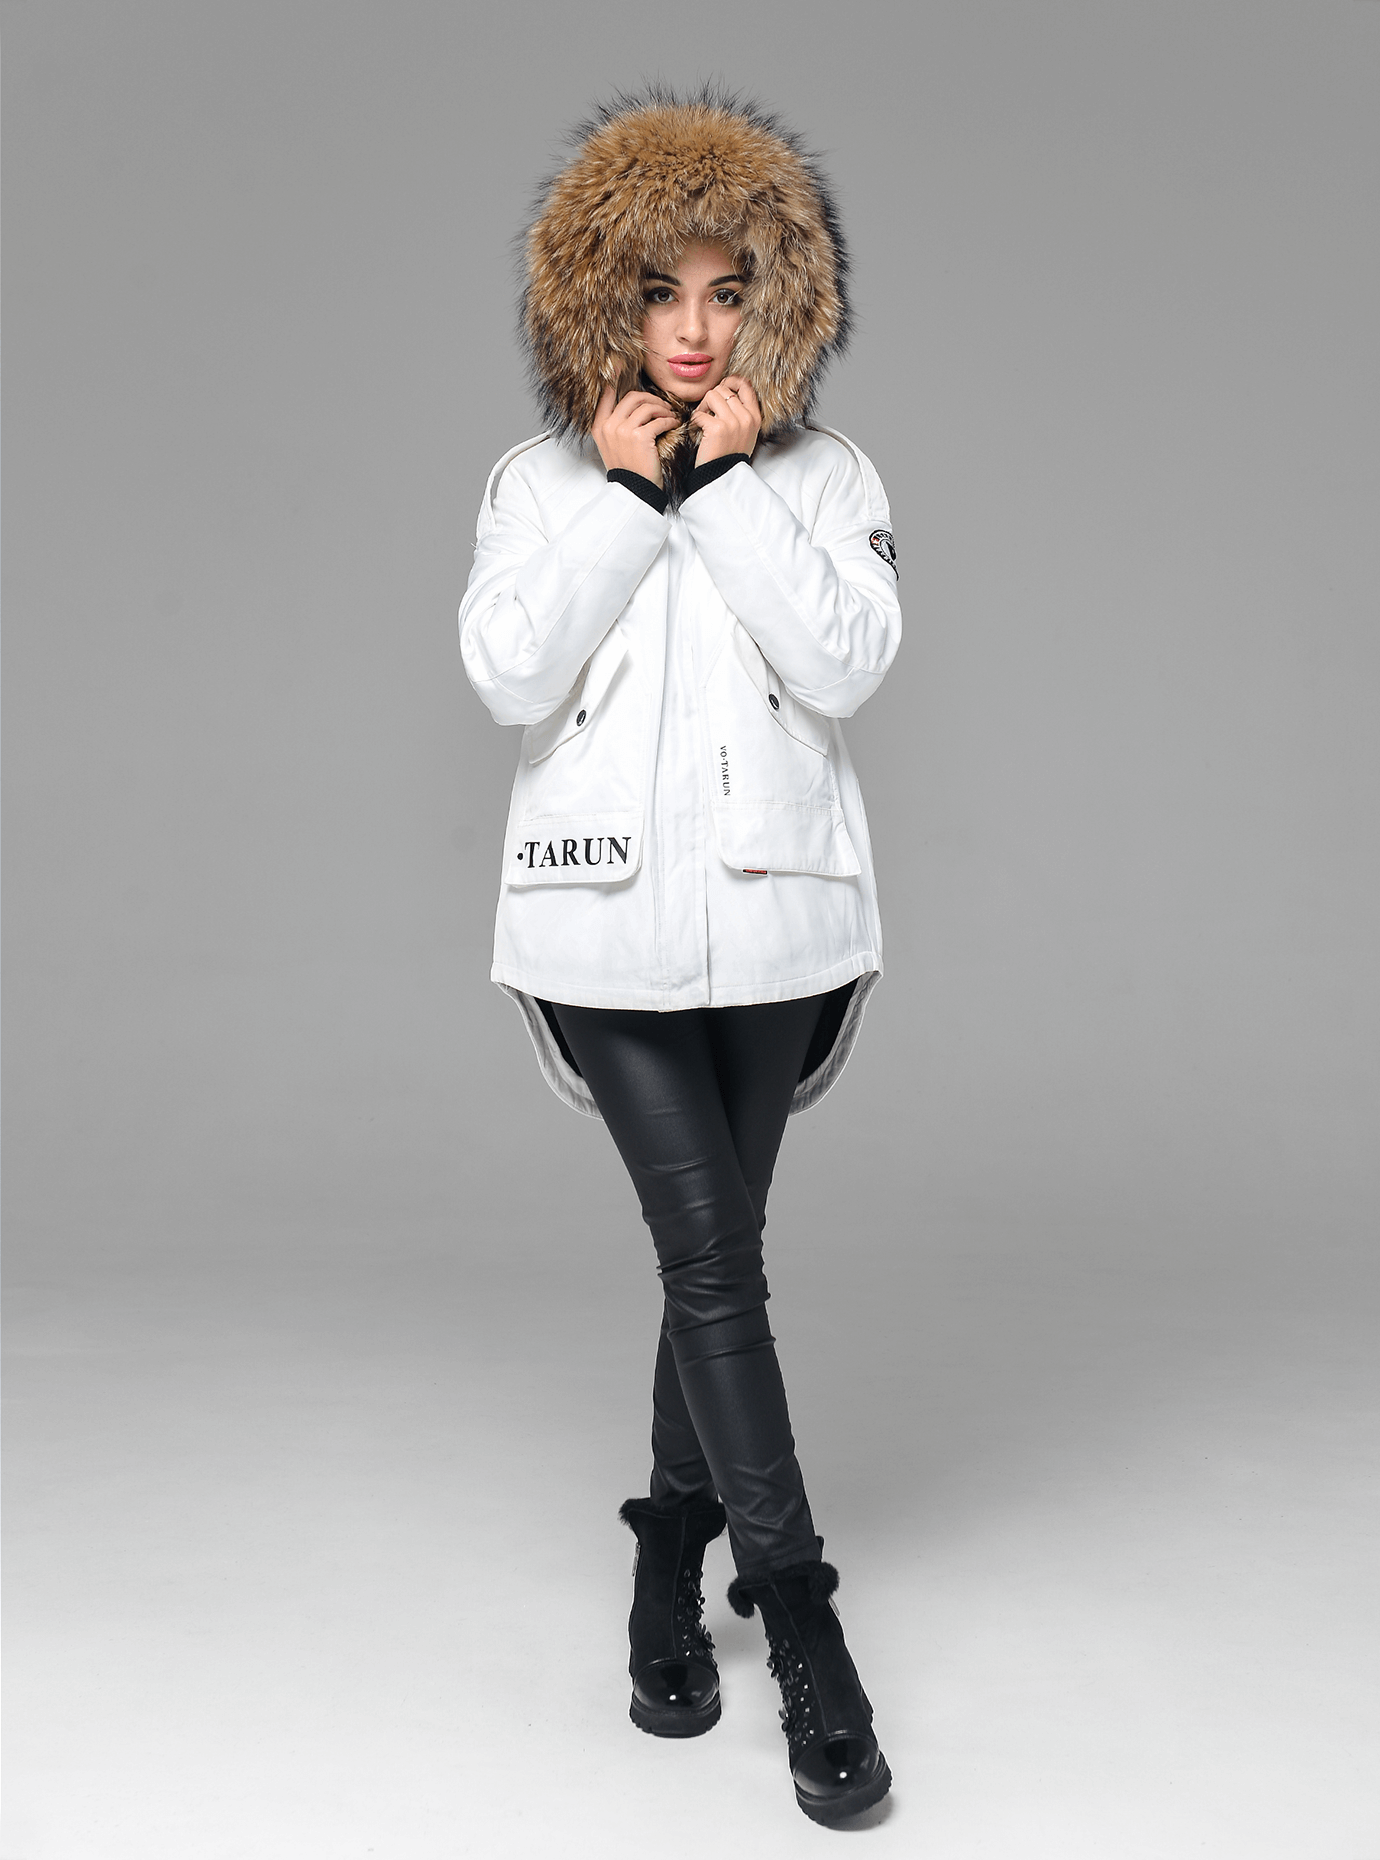 Зимняя куртка-парка с мехом енота Белый XL (05-V191228): фото - Alster.ua